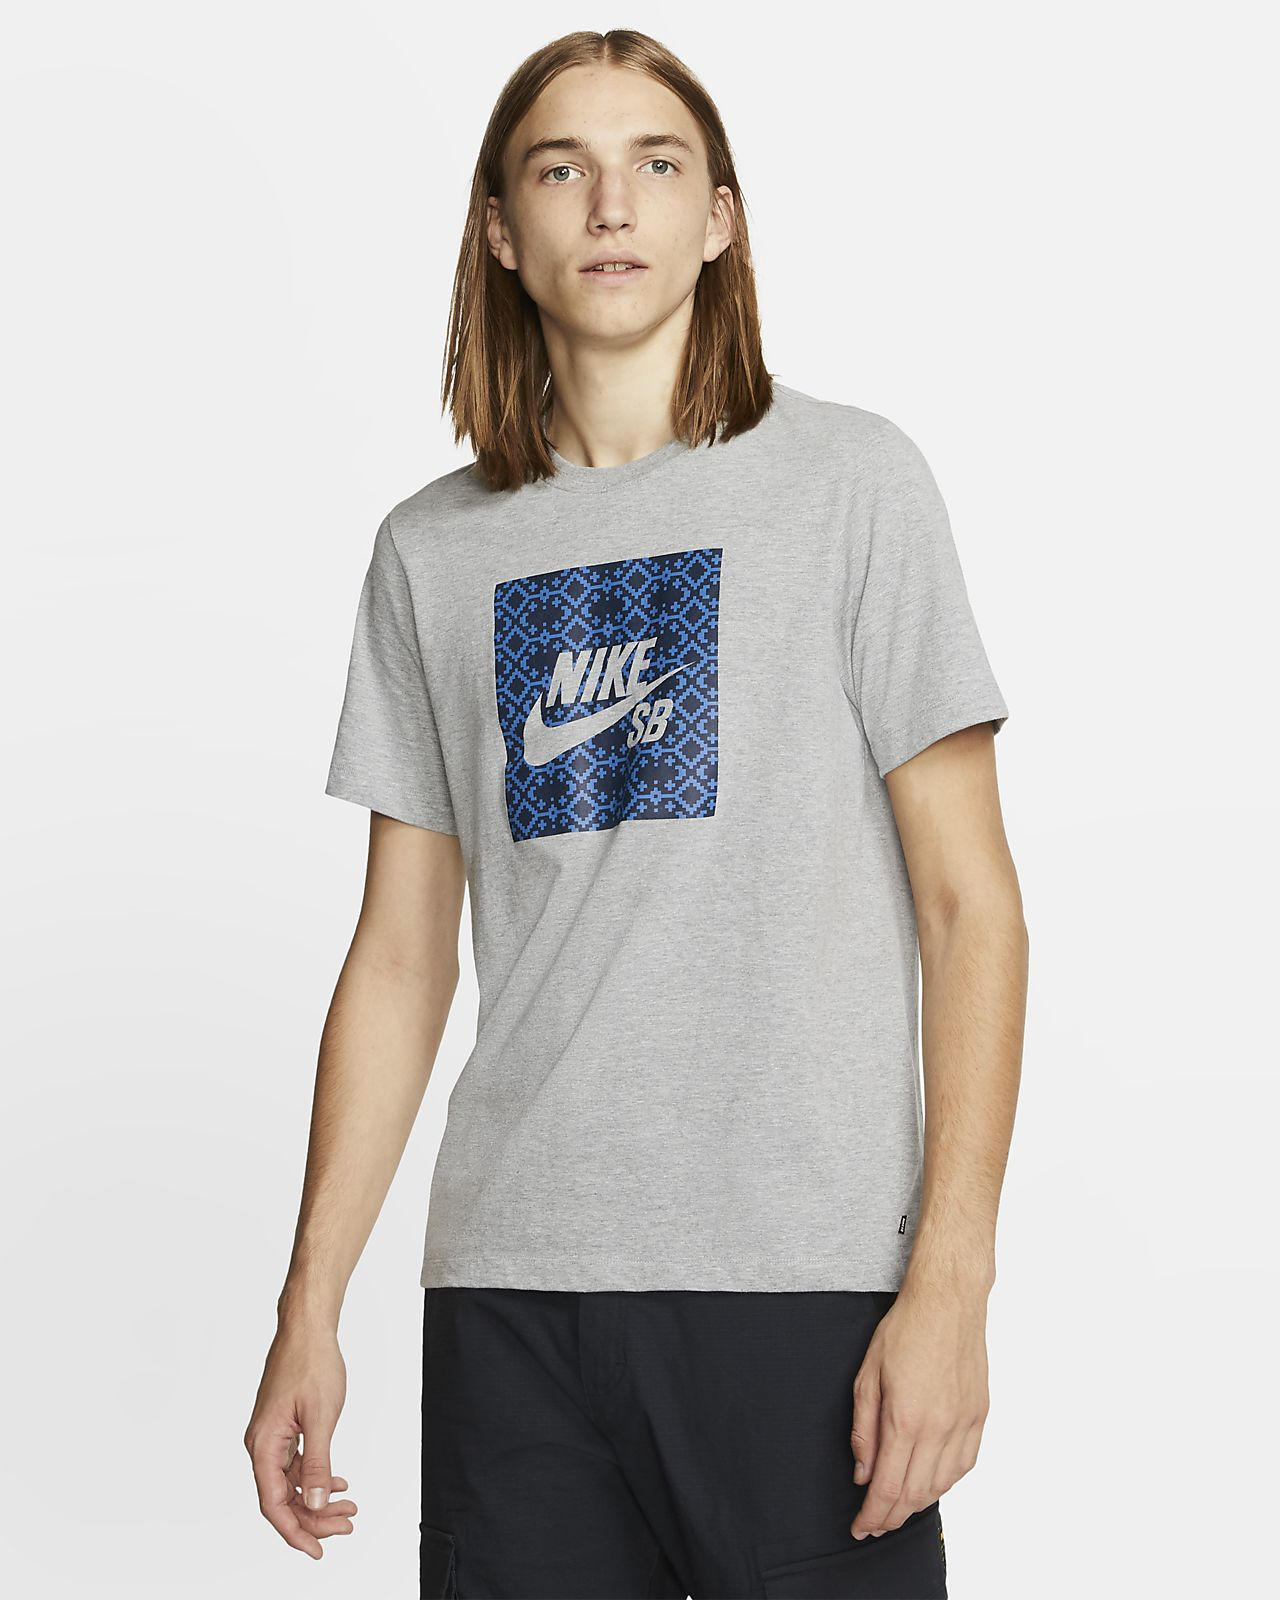 Męski T shirt do skateboardingu z logo Nike SB. Nike PL